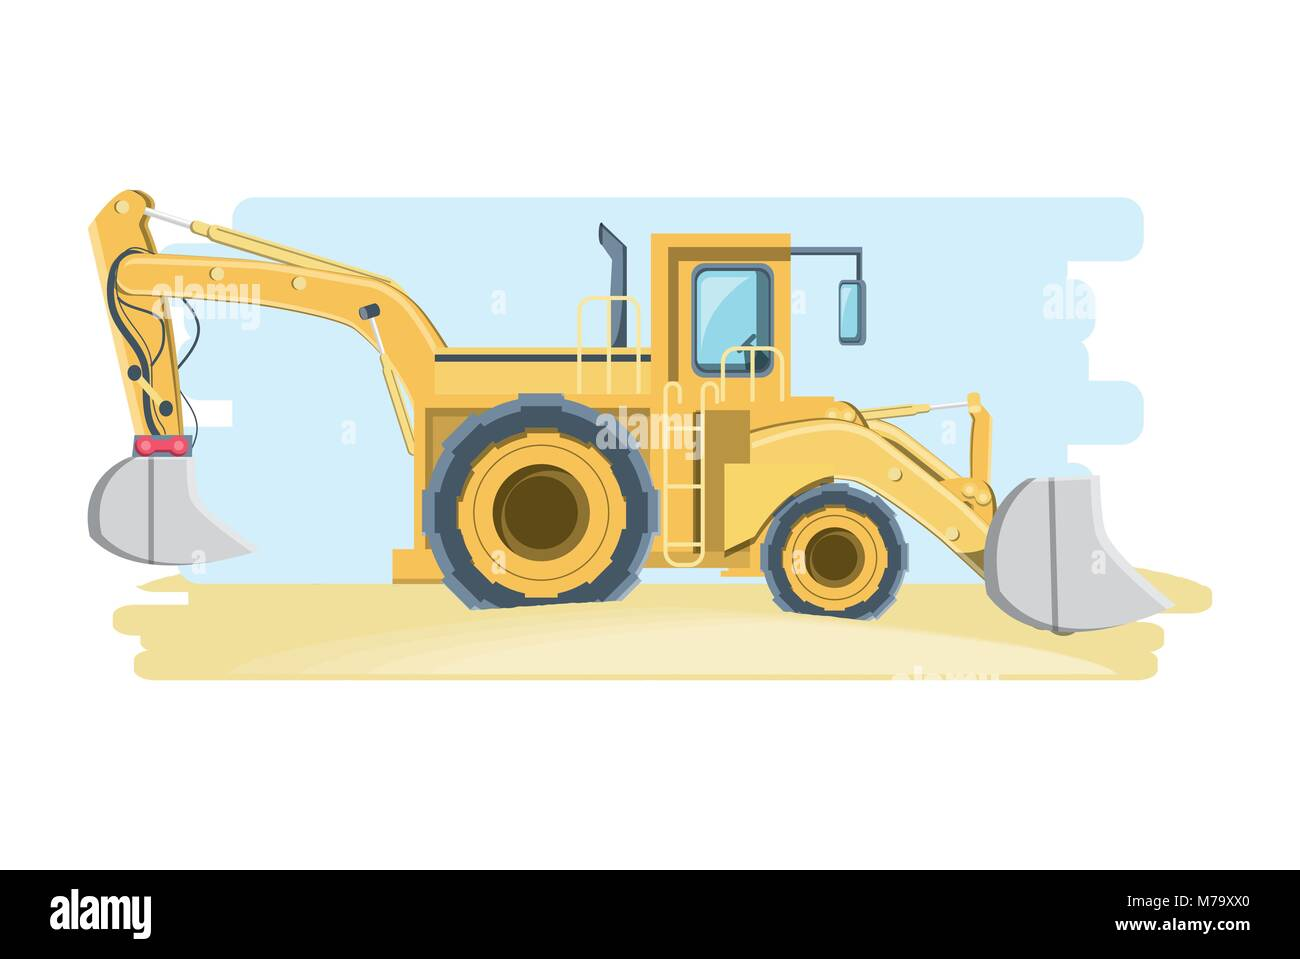 Construction Front And Backhoe Loader Truck Over White Background Colorful Design Vector Illustration